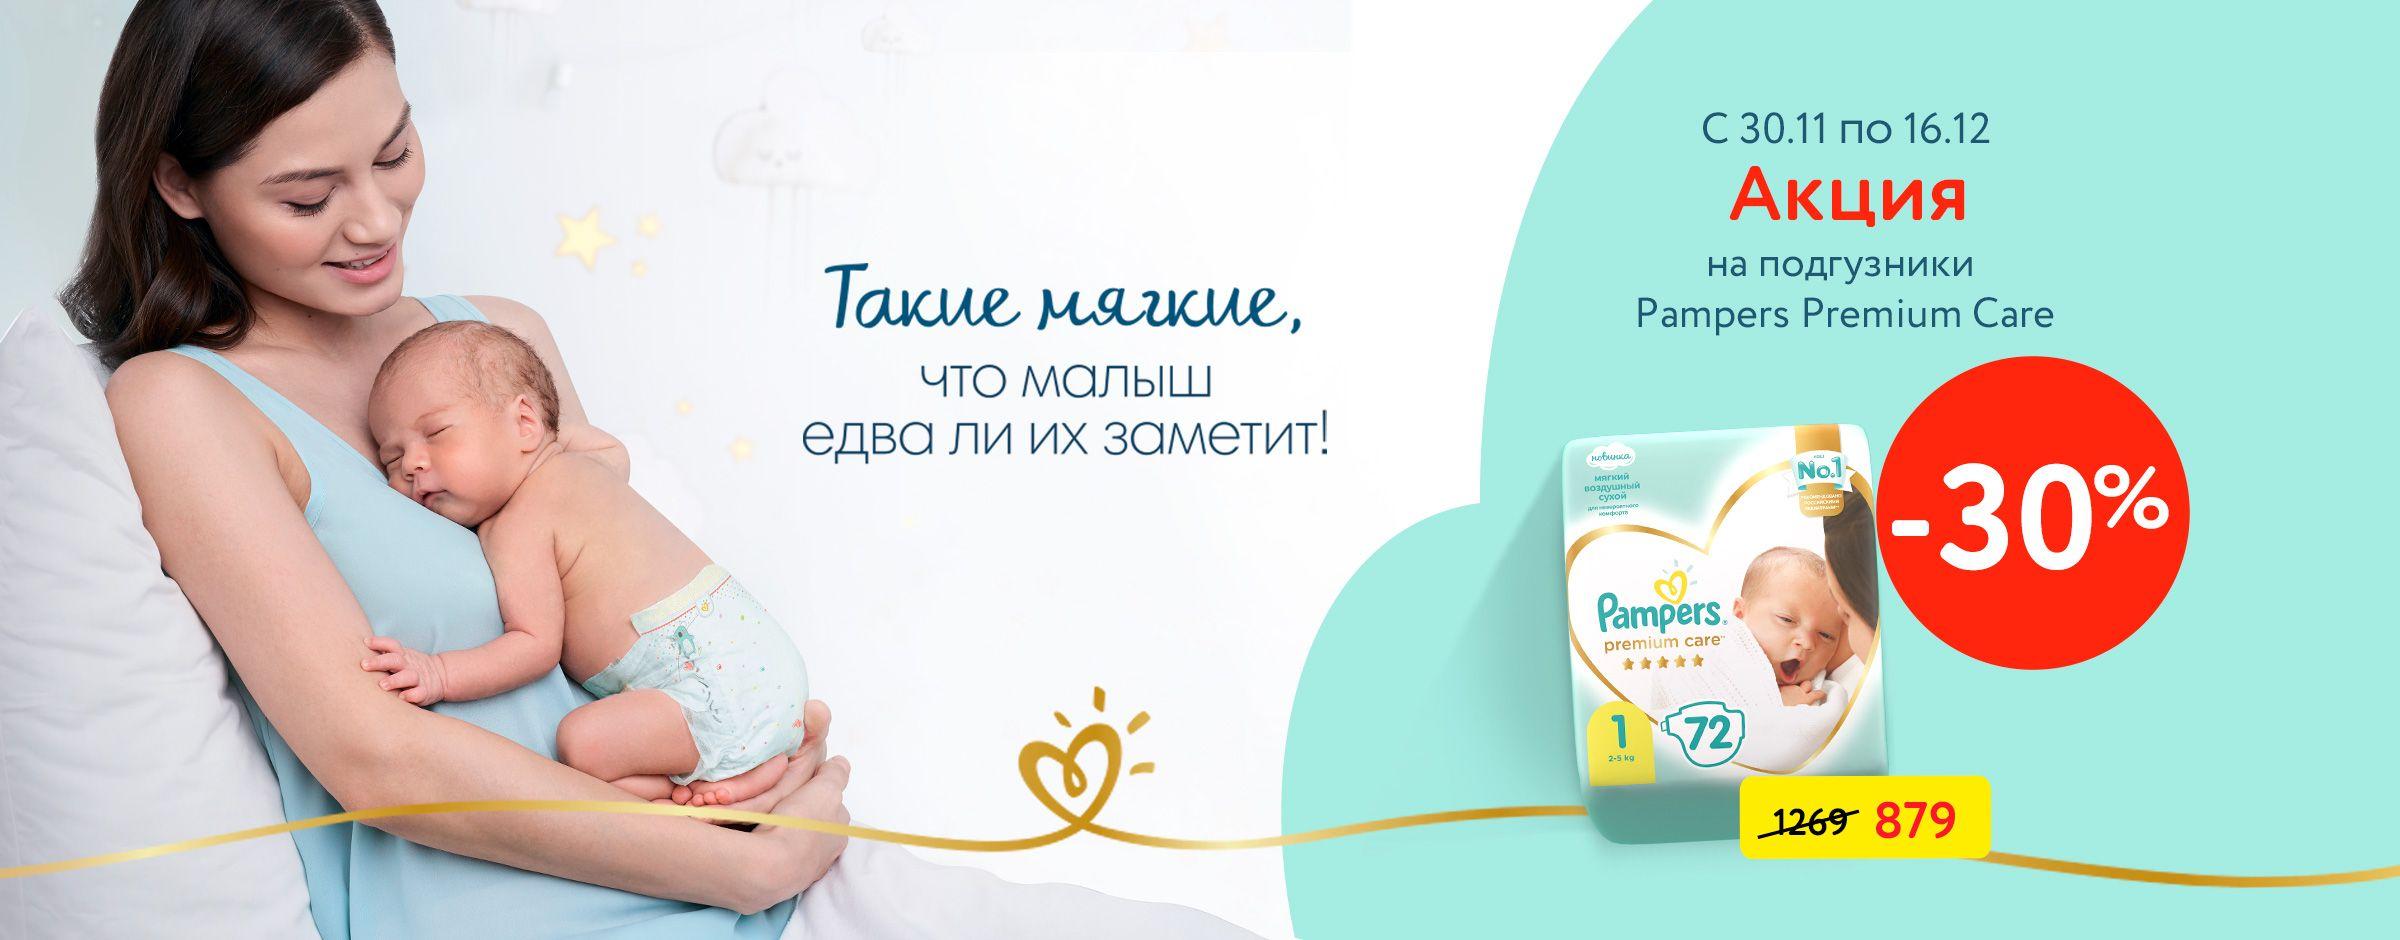 30% на подгузники Pampers Premium care Подгузники